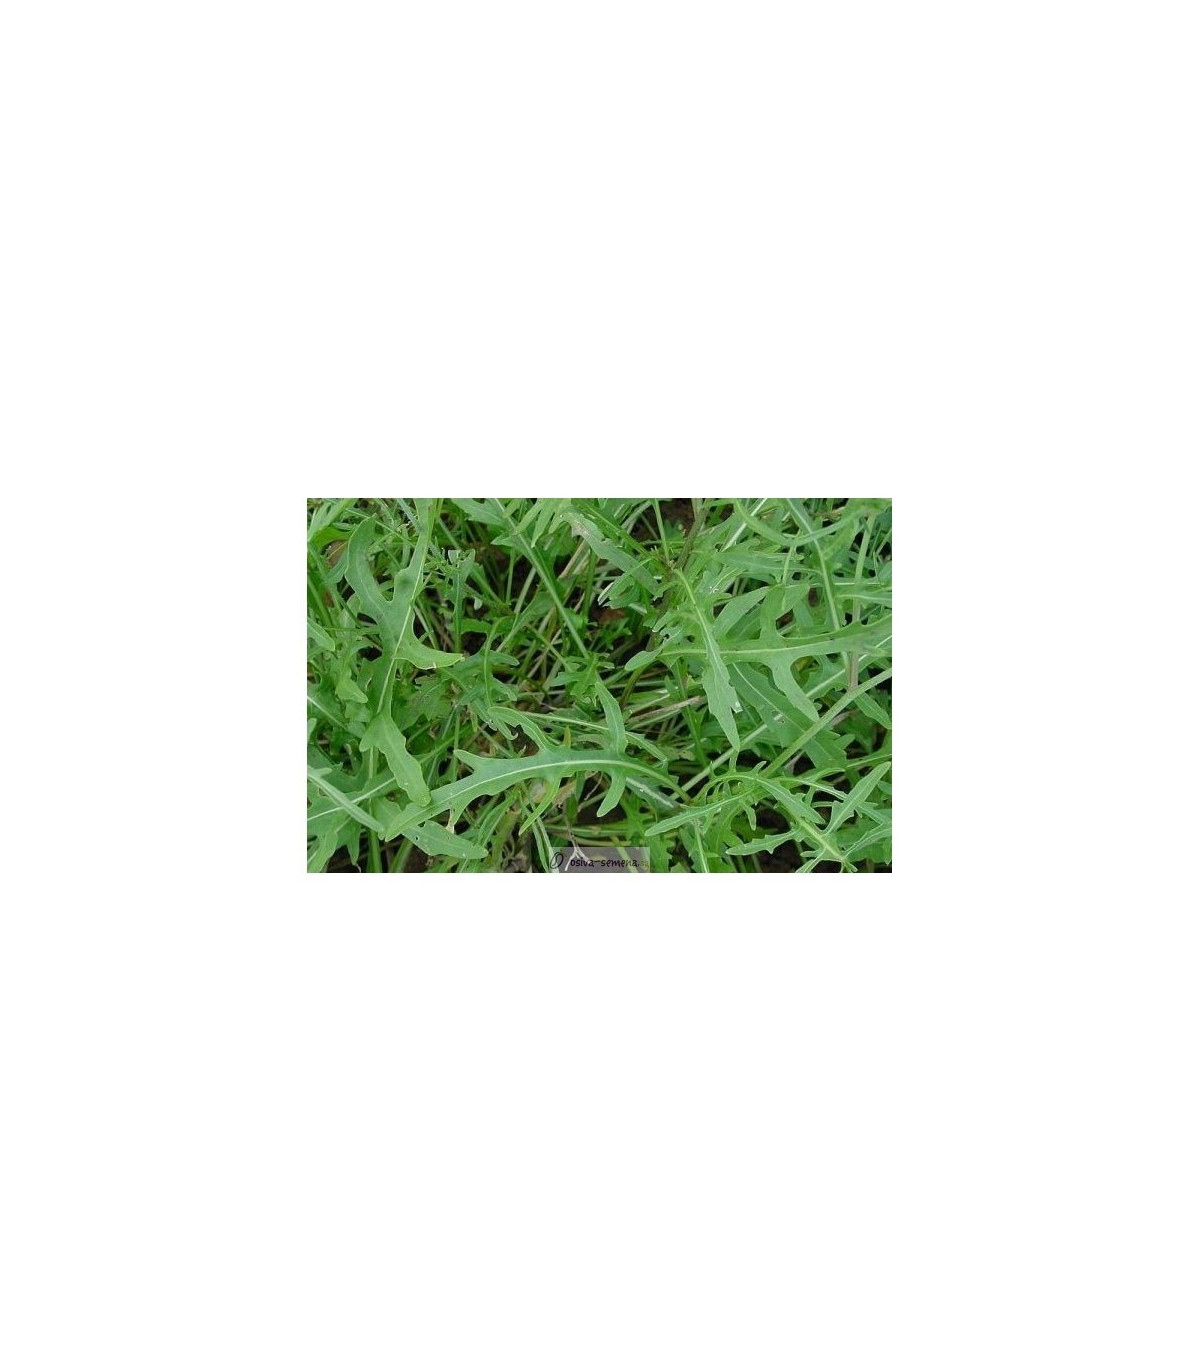 BIO Rukola Roma - Diplotaxis tenuifolia - semená rukoly - semiačka - 50 ks